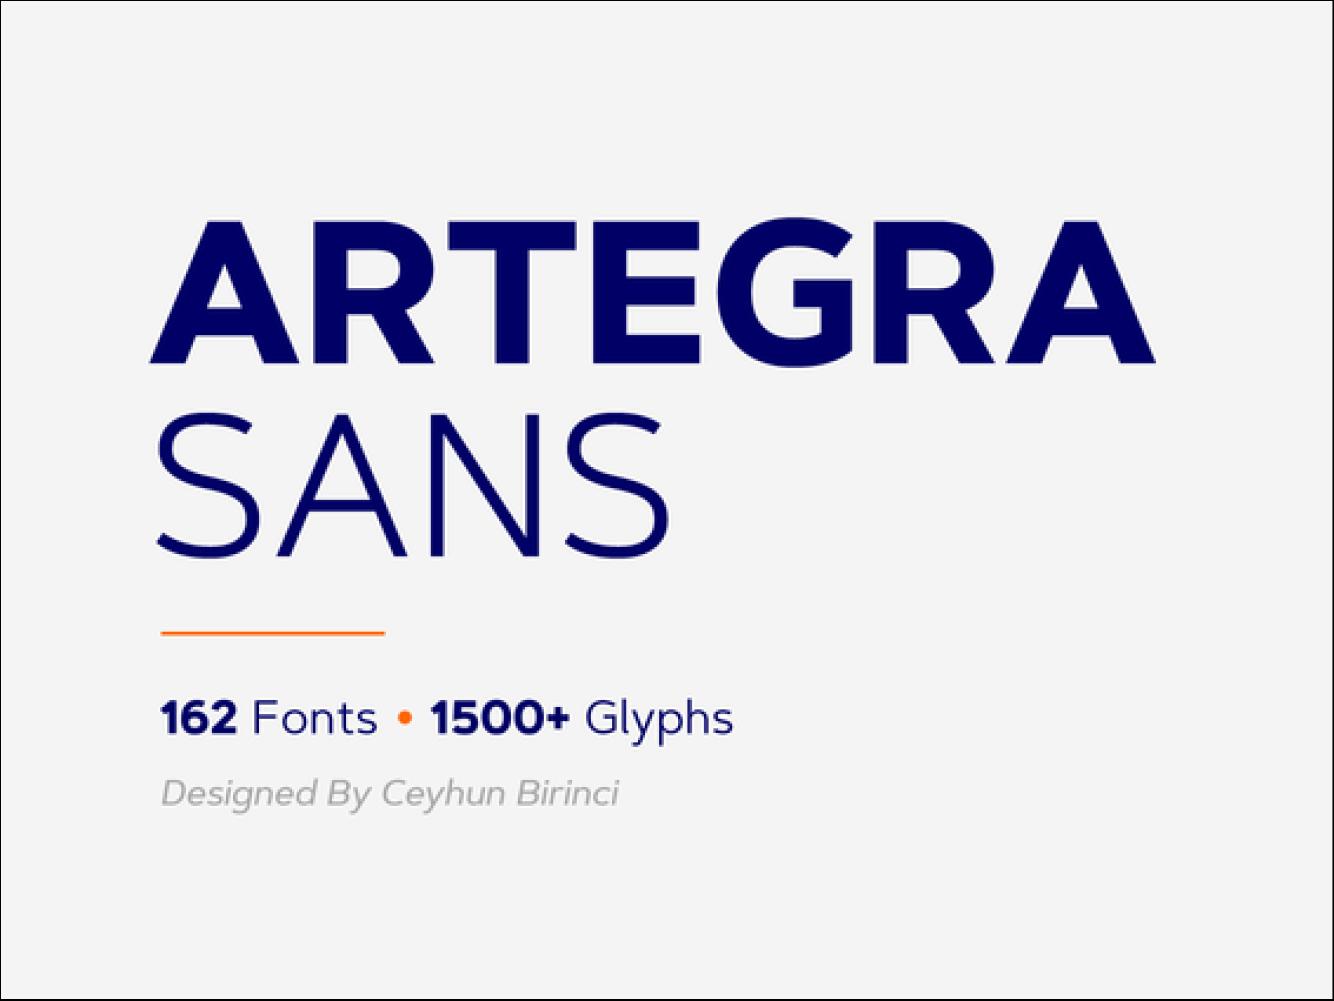 Artegra Sans